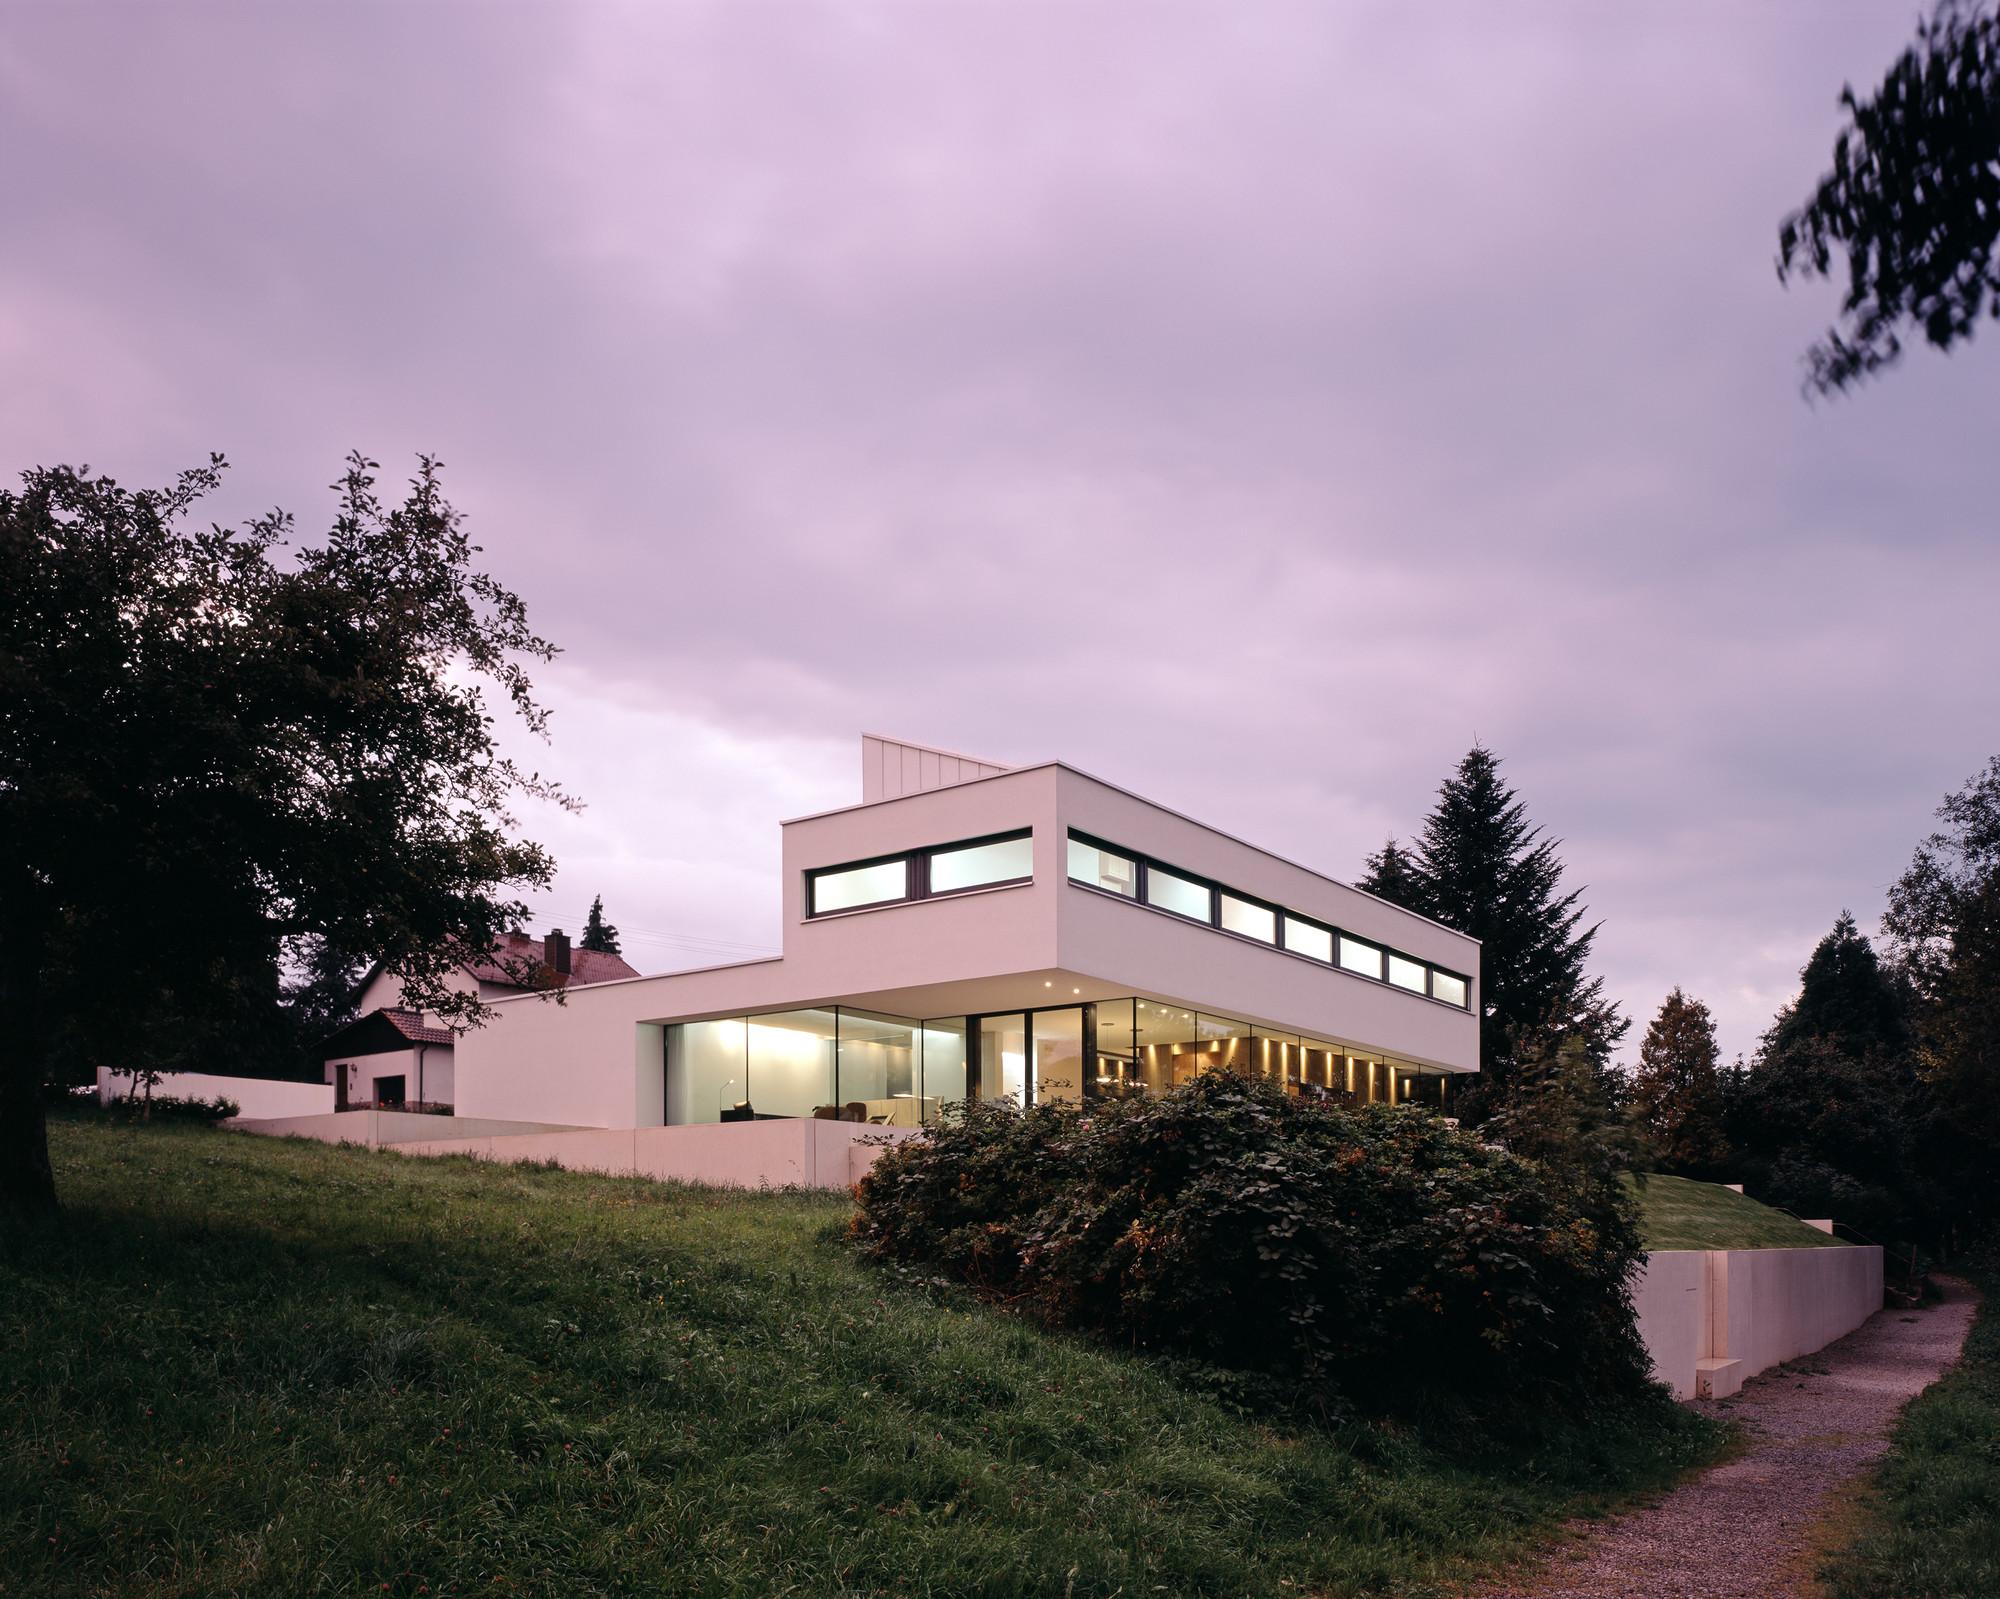 Galeria de casa p philipp architekten 44 - Philipp architekten ...